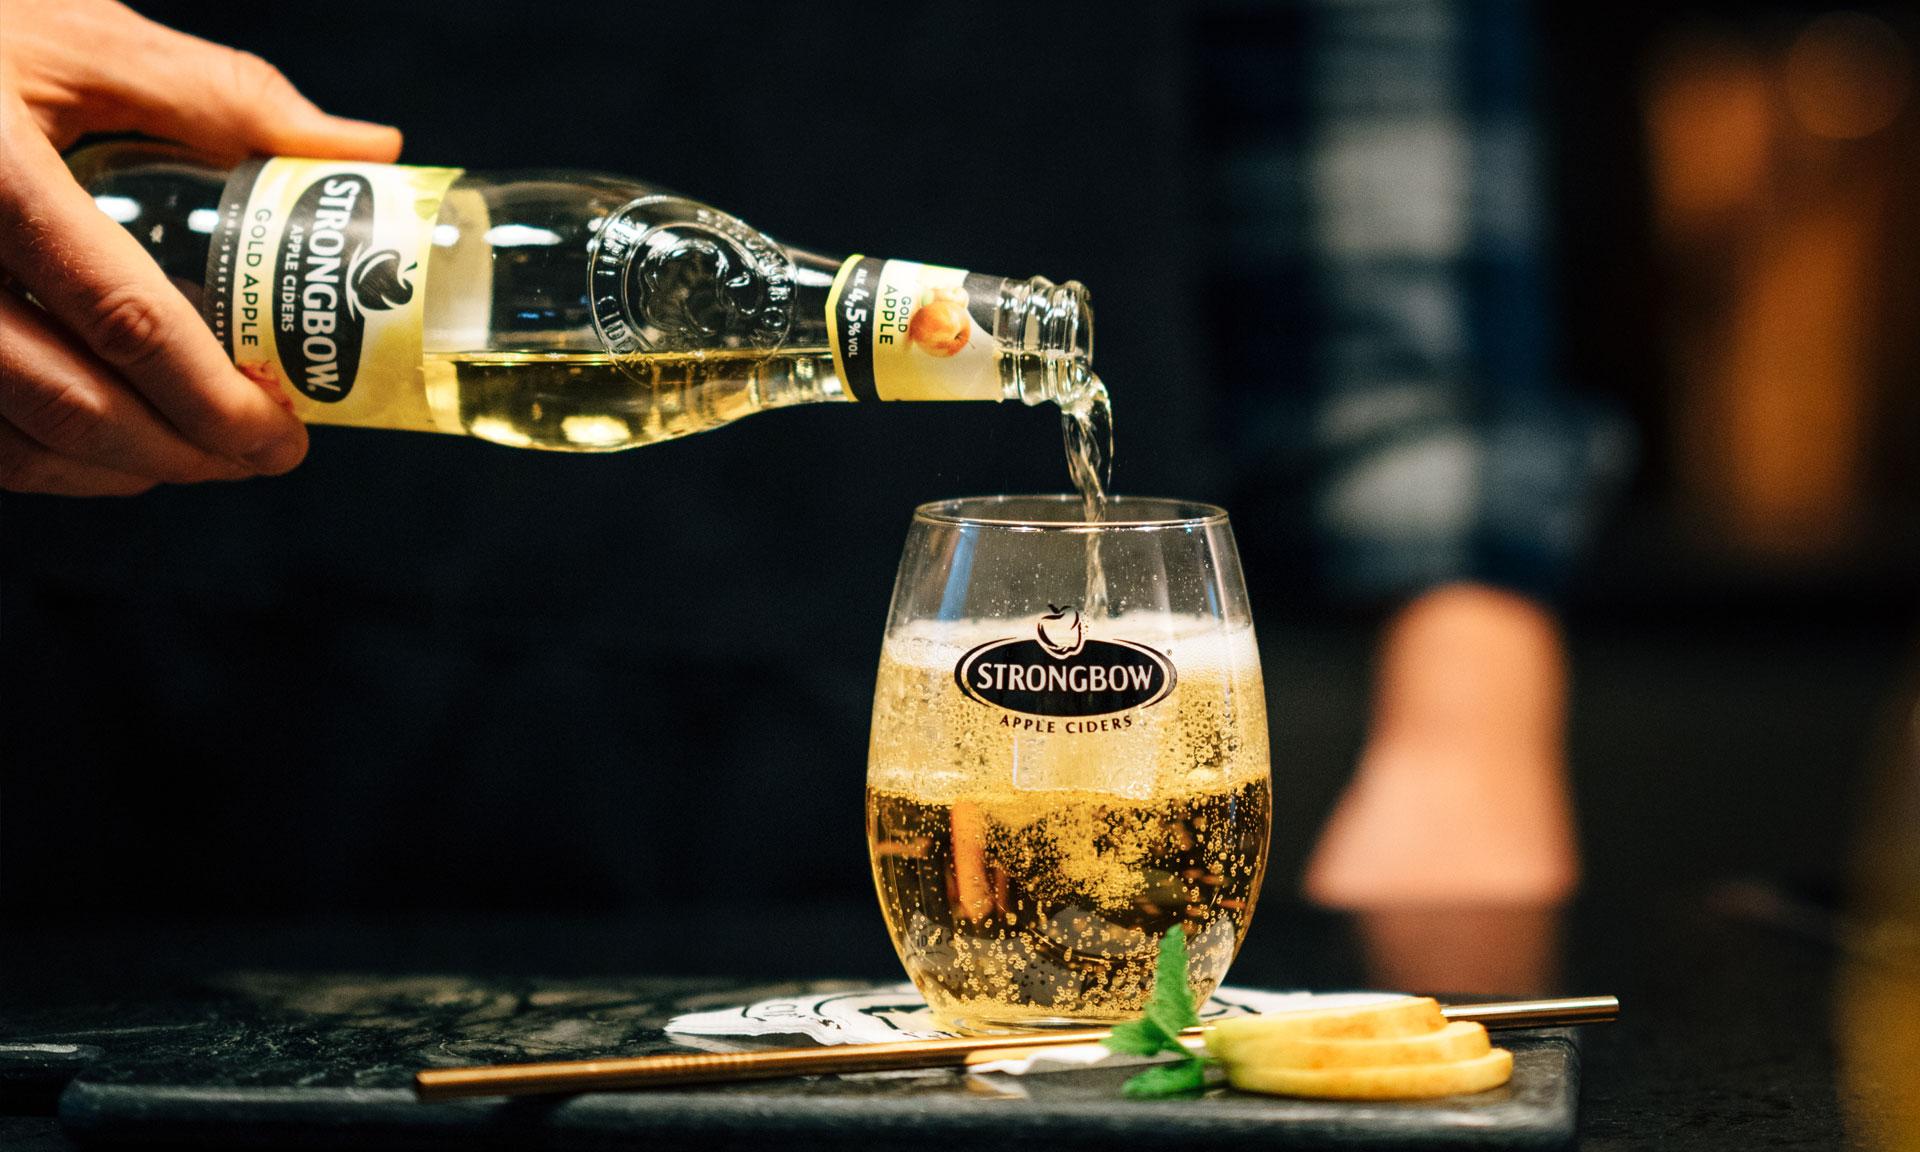 Cider-Strongbow-Brauunion-Graz